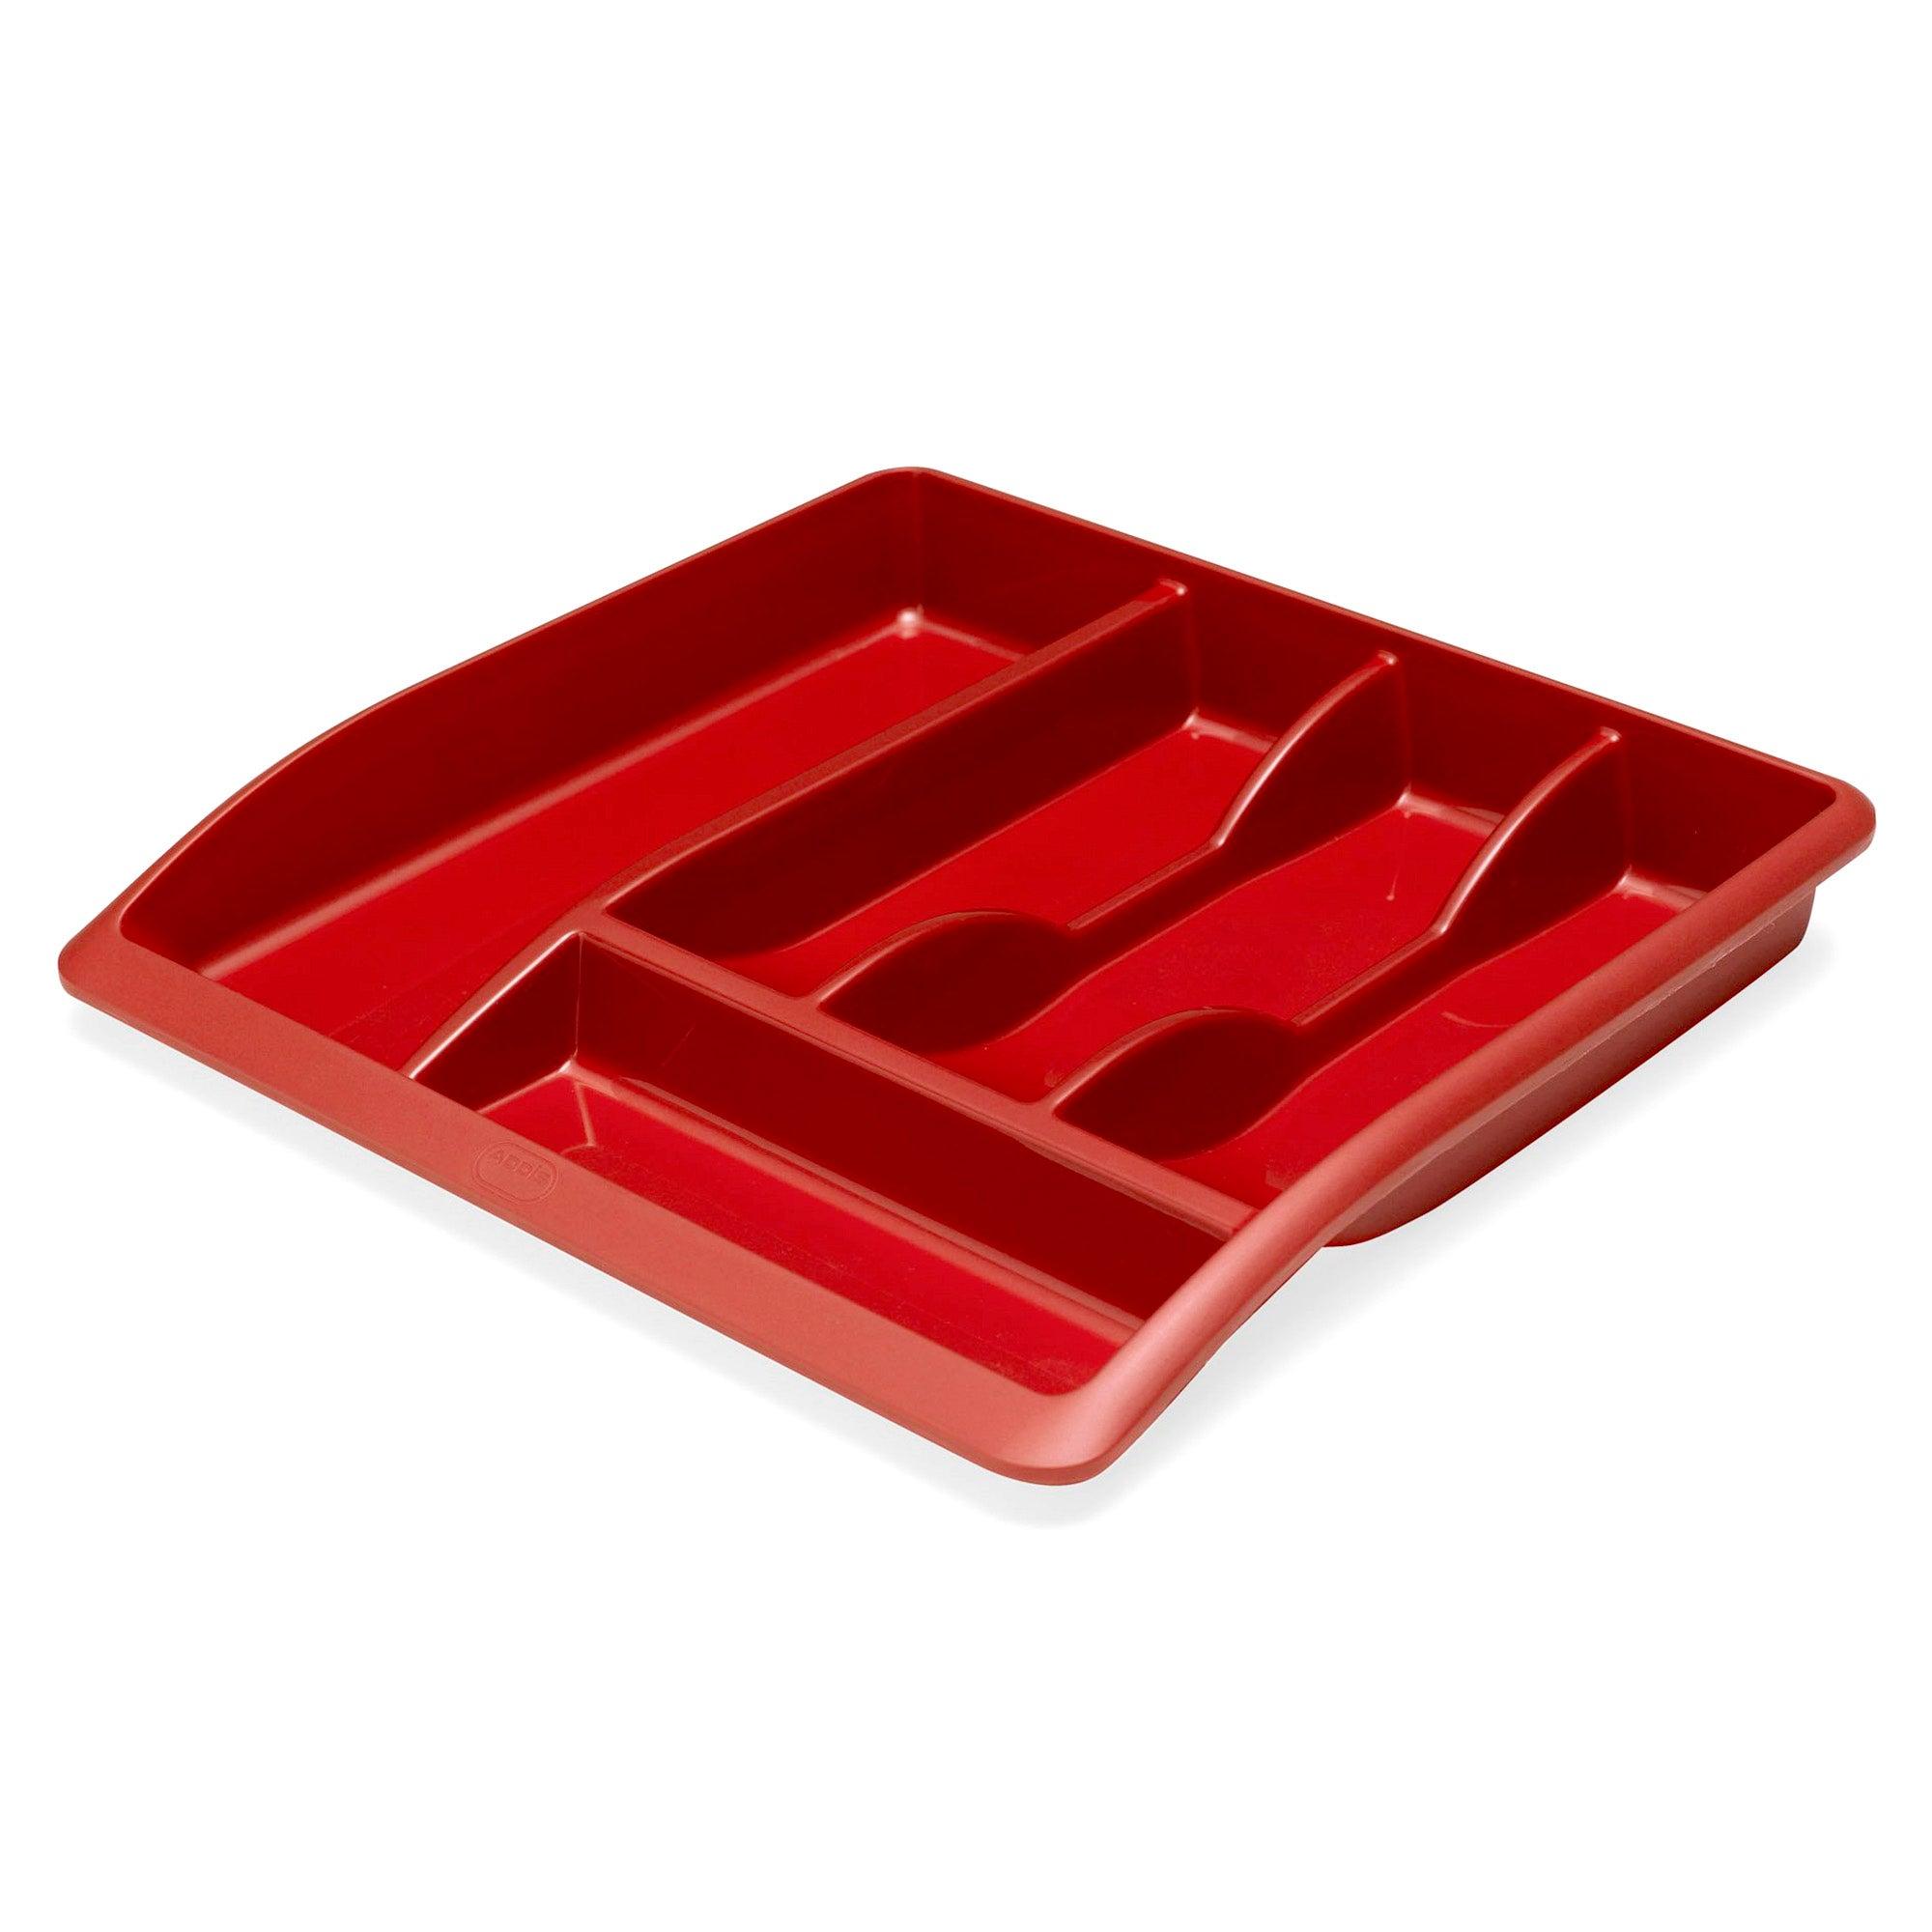 Red Spectrum Collection Drawer Organiser